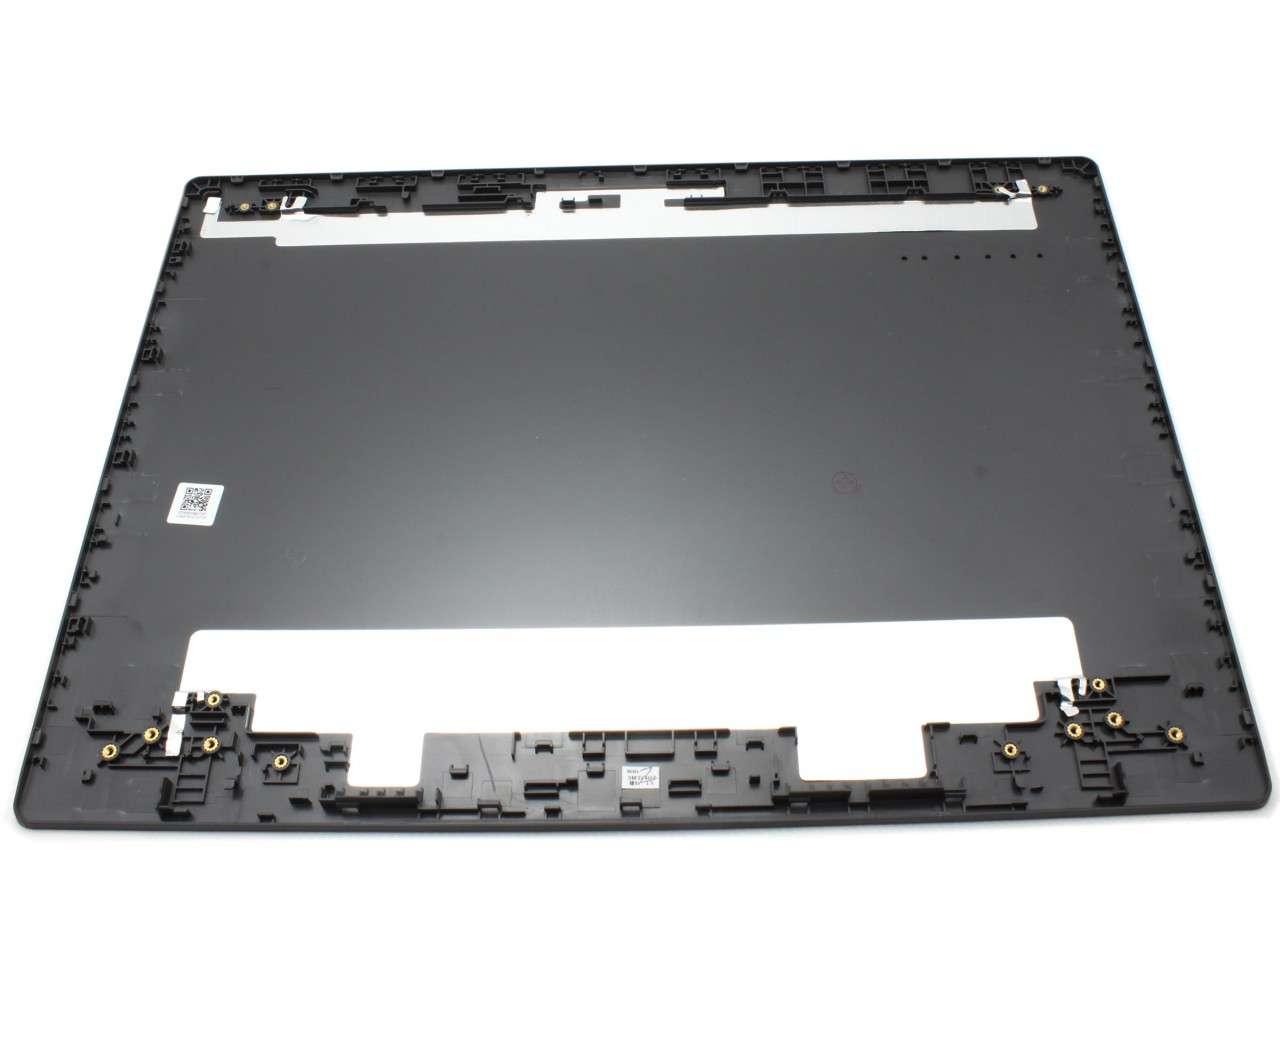 Capac Display BackCover Lenovo V330-14IKB Carcasa Display imagine powerlaptop.ro 2021